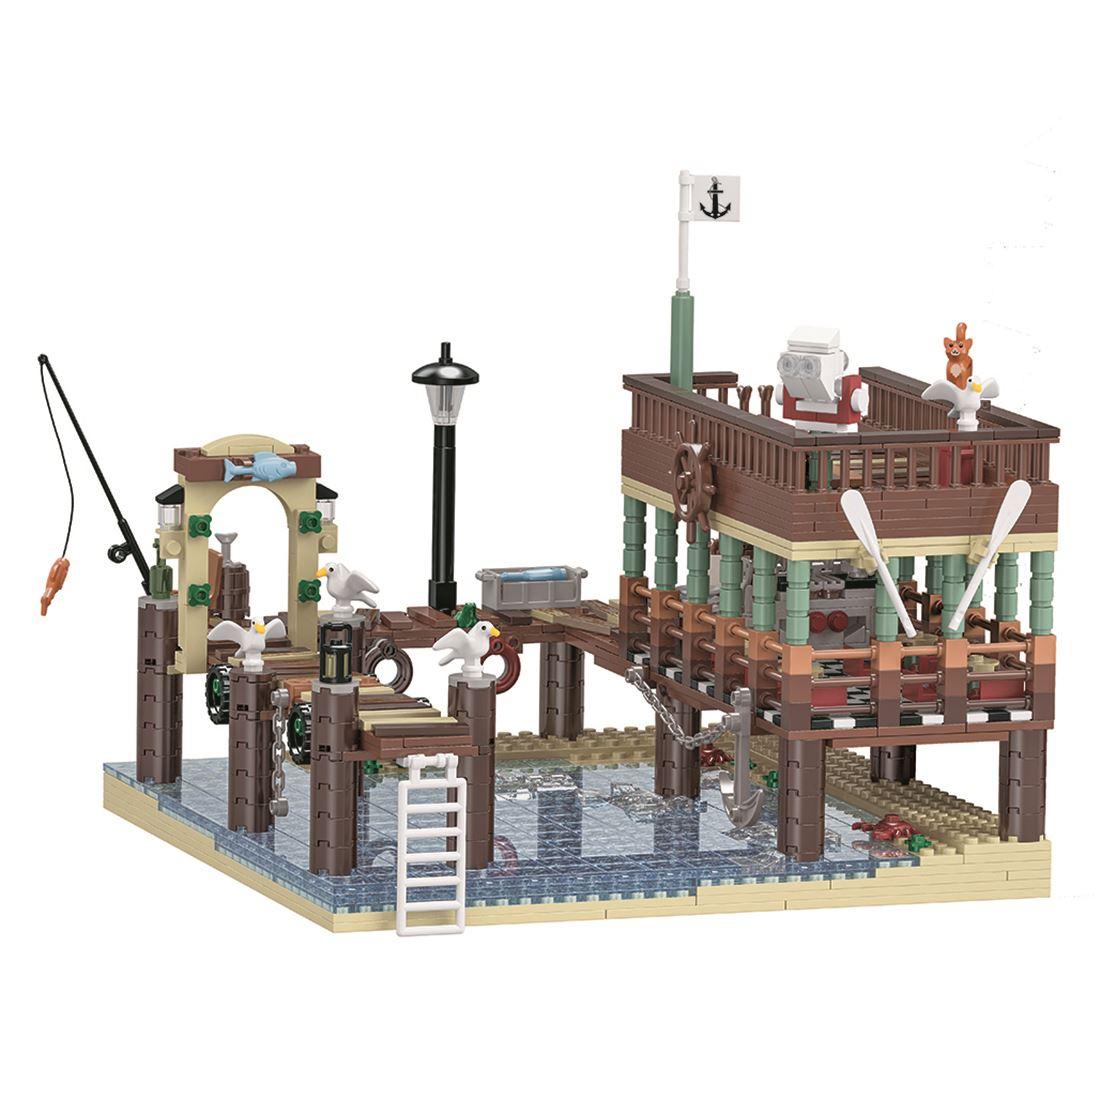 1394Pcs MOC Small Particle 3D Street View Fish House Pier Building Blocks DIY Assembly Building Kit Building & Construction Toys